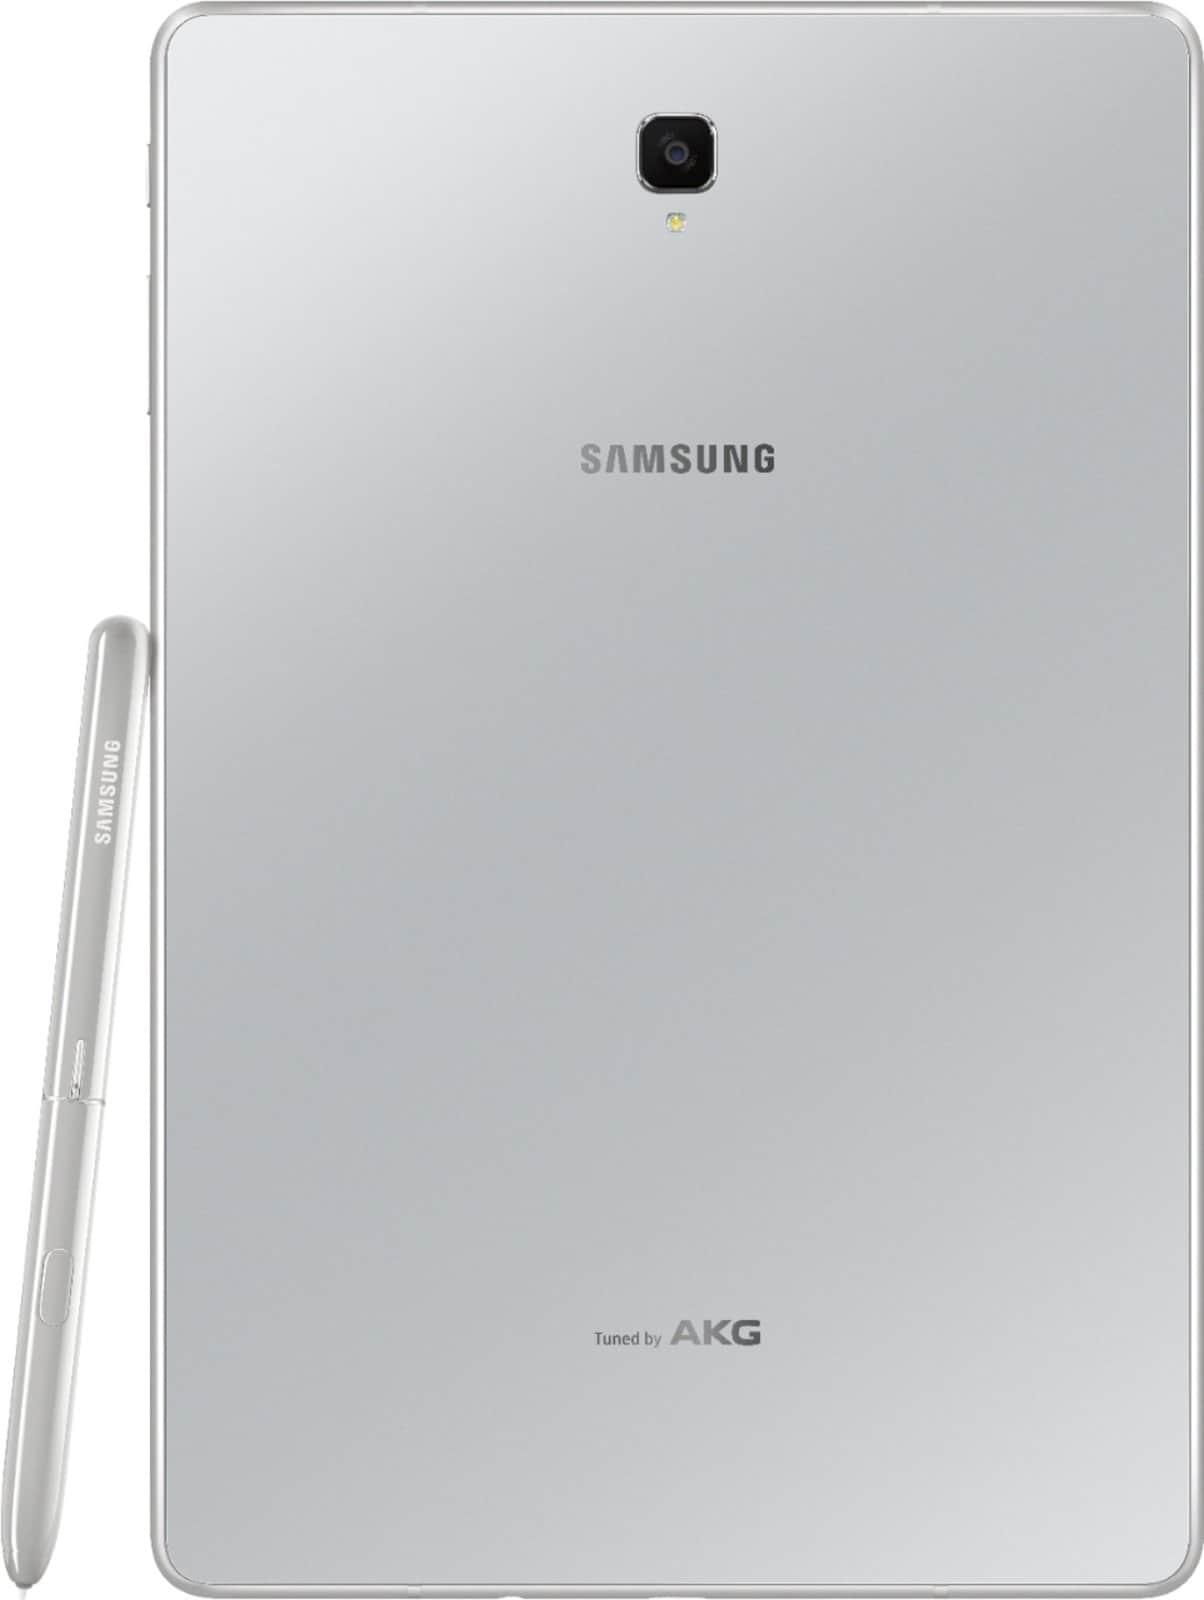 Galaxy Tab S4 render leak 1112